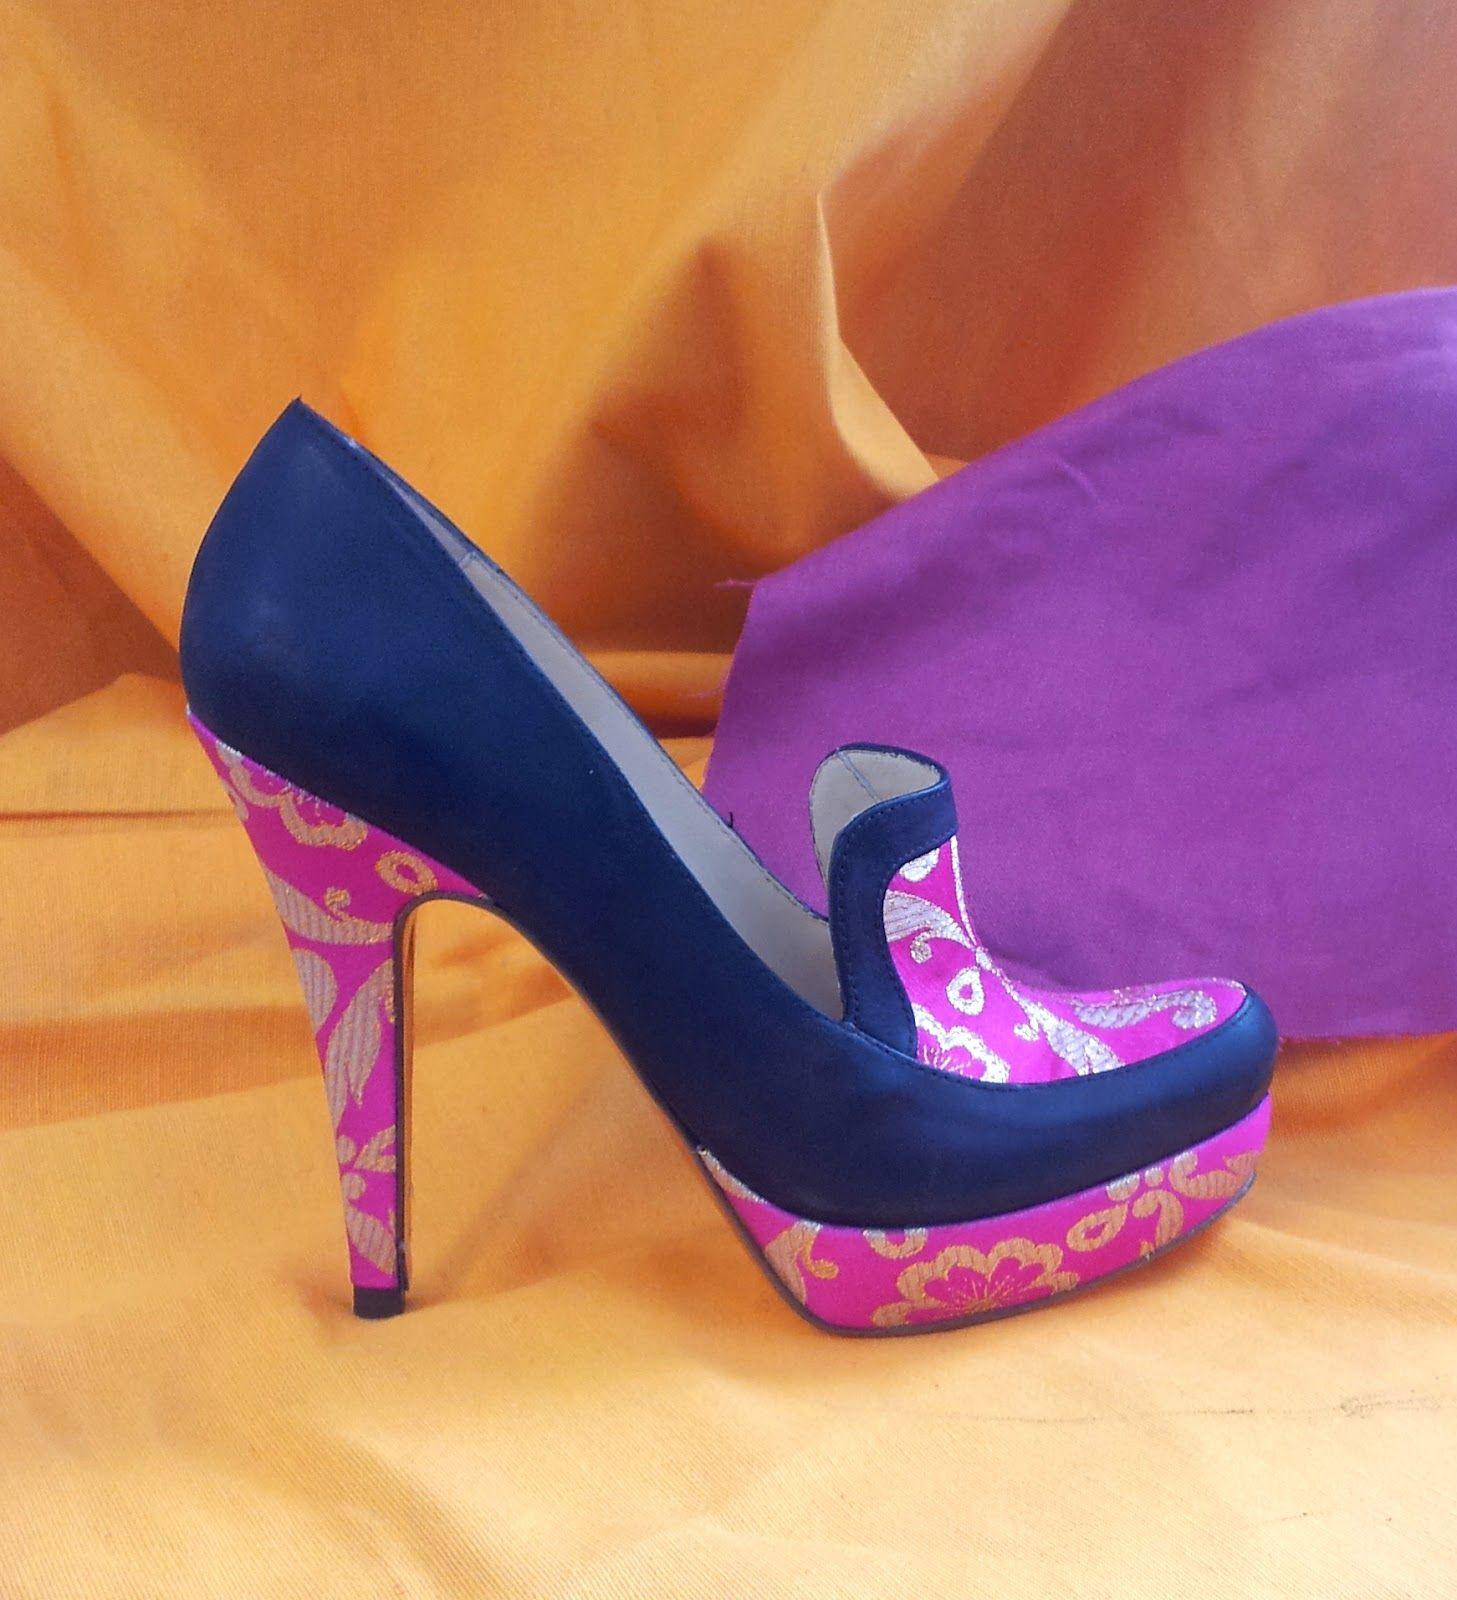 LADY TRAP en los TOROS | Life Style Taurino | Pinterest | Taurina ...